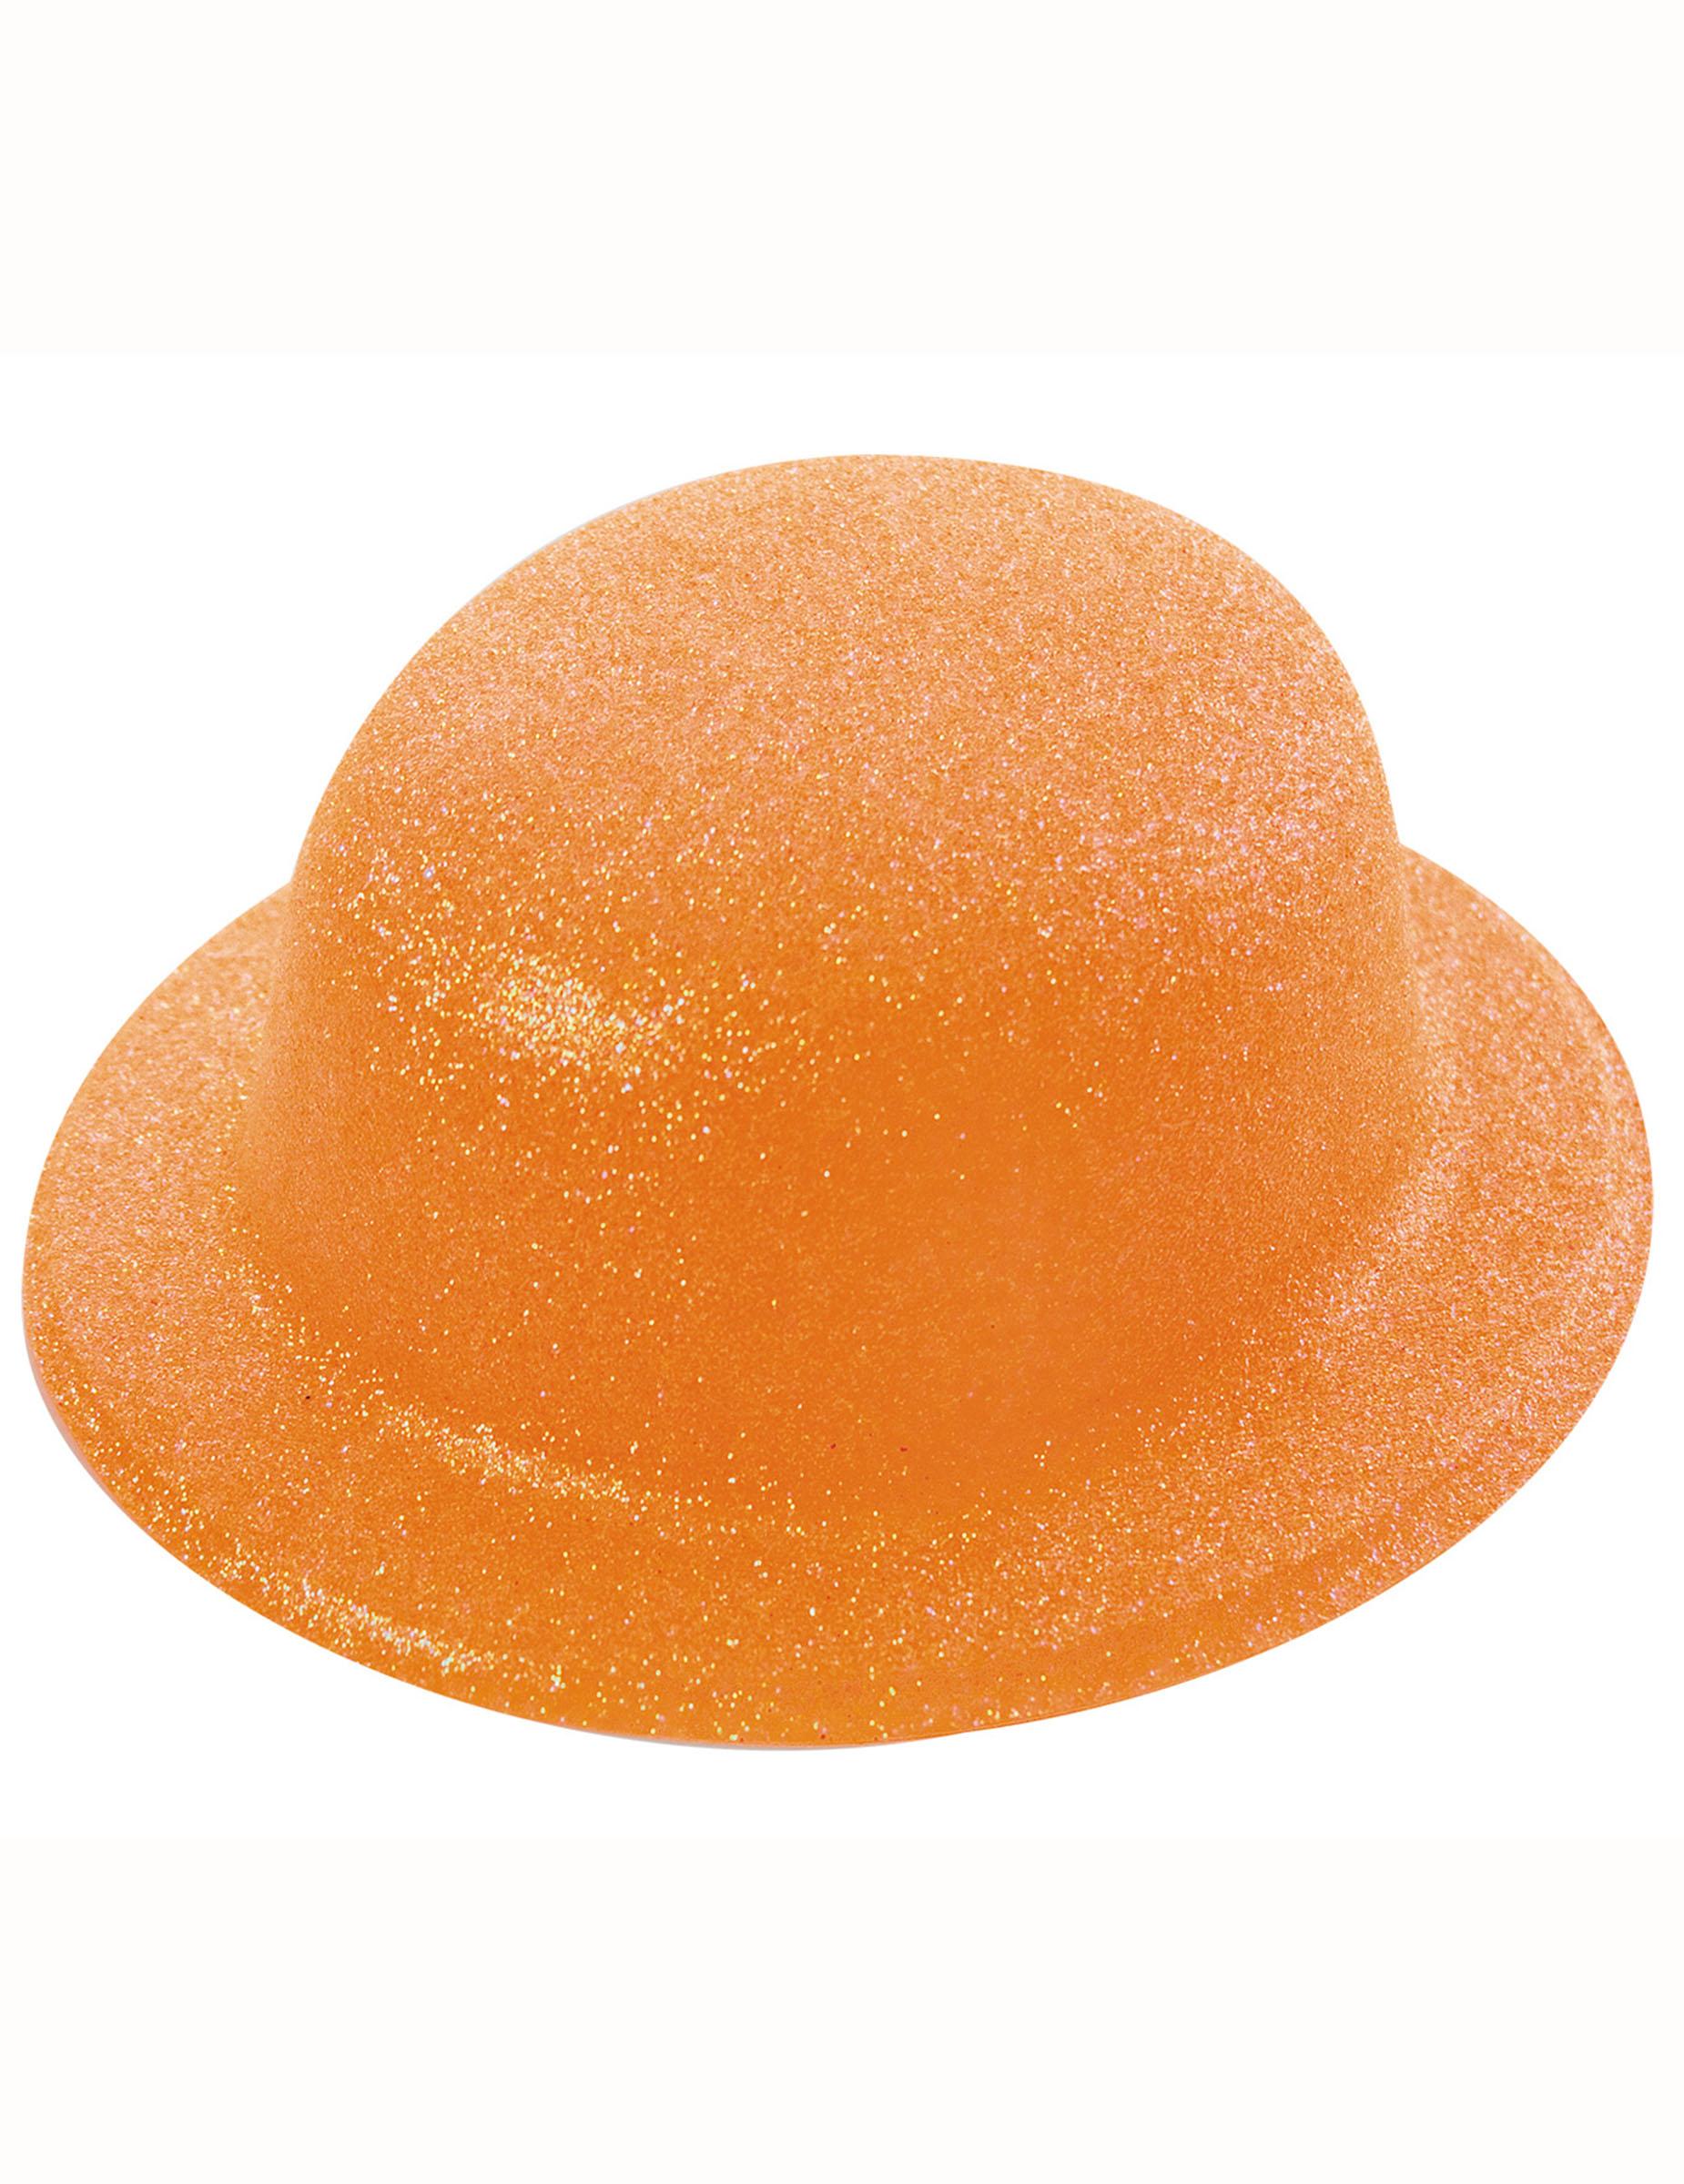 Sombrero bombín brillante naranja adulto  Sombreros 71709037732